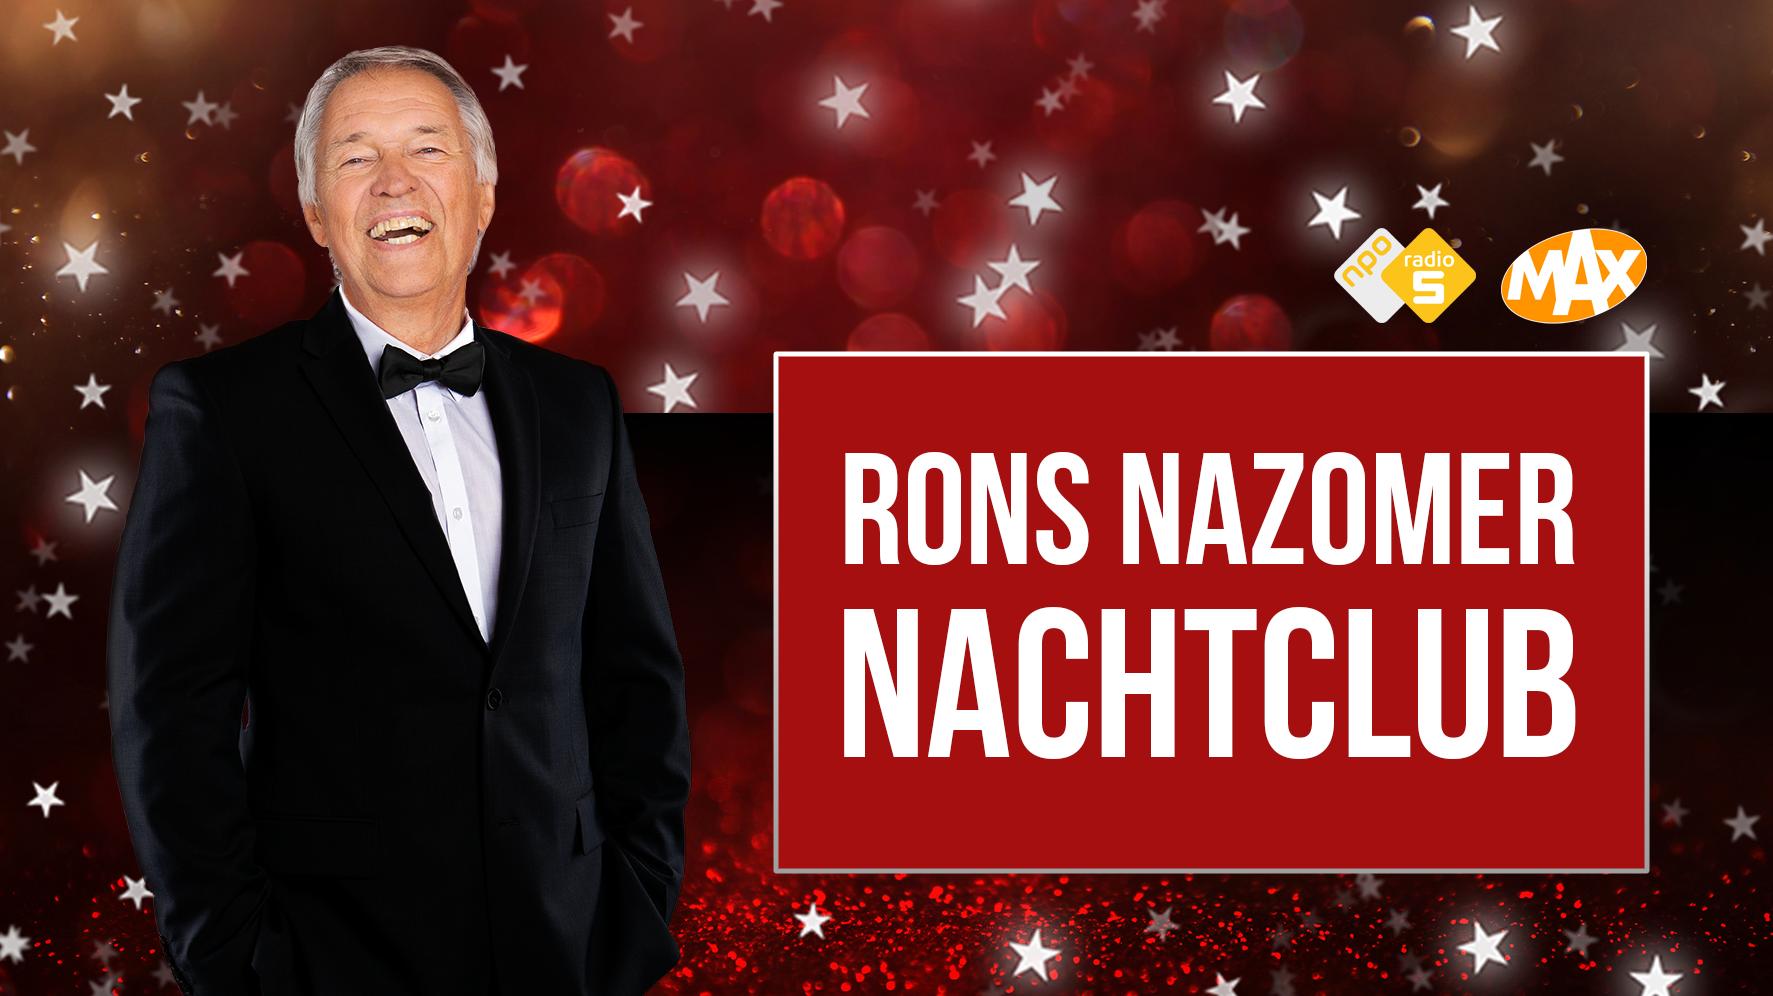 Rons Nazomer Nachtclub